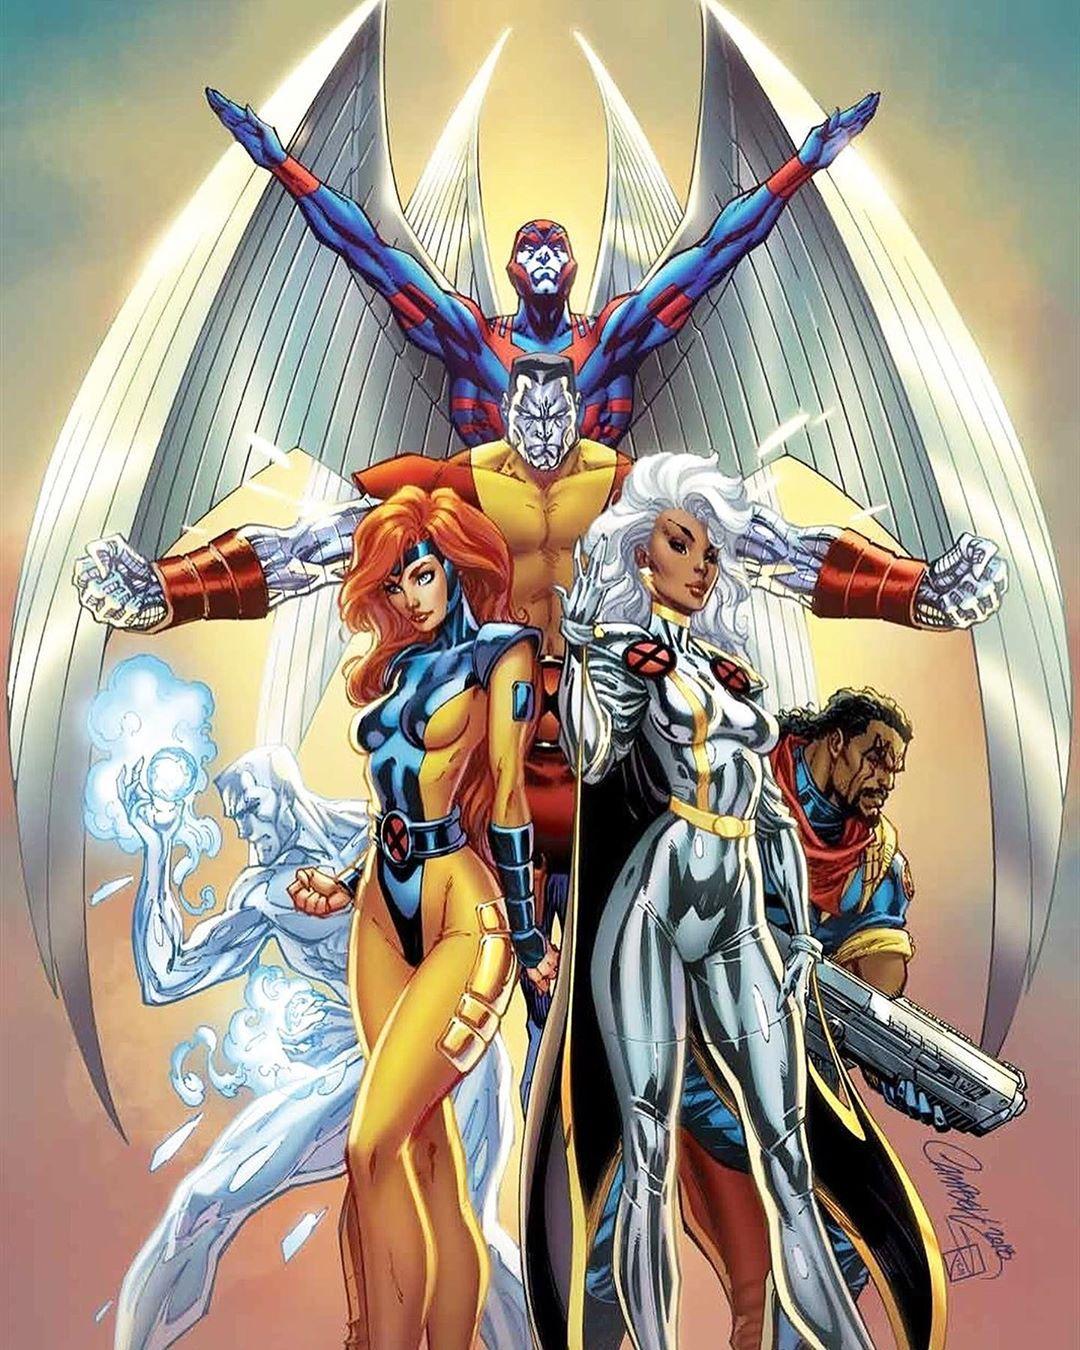 Xhema V On Instagram X Men Gold Team Base Of Operations 1407 Graymalkin Lane Salem Center We In 2020 Marvel Superheroes X Men Marvel Comics Art